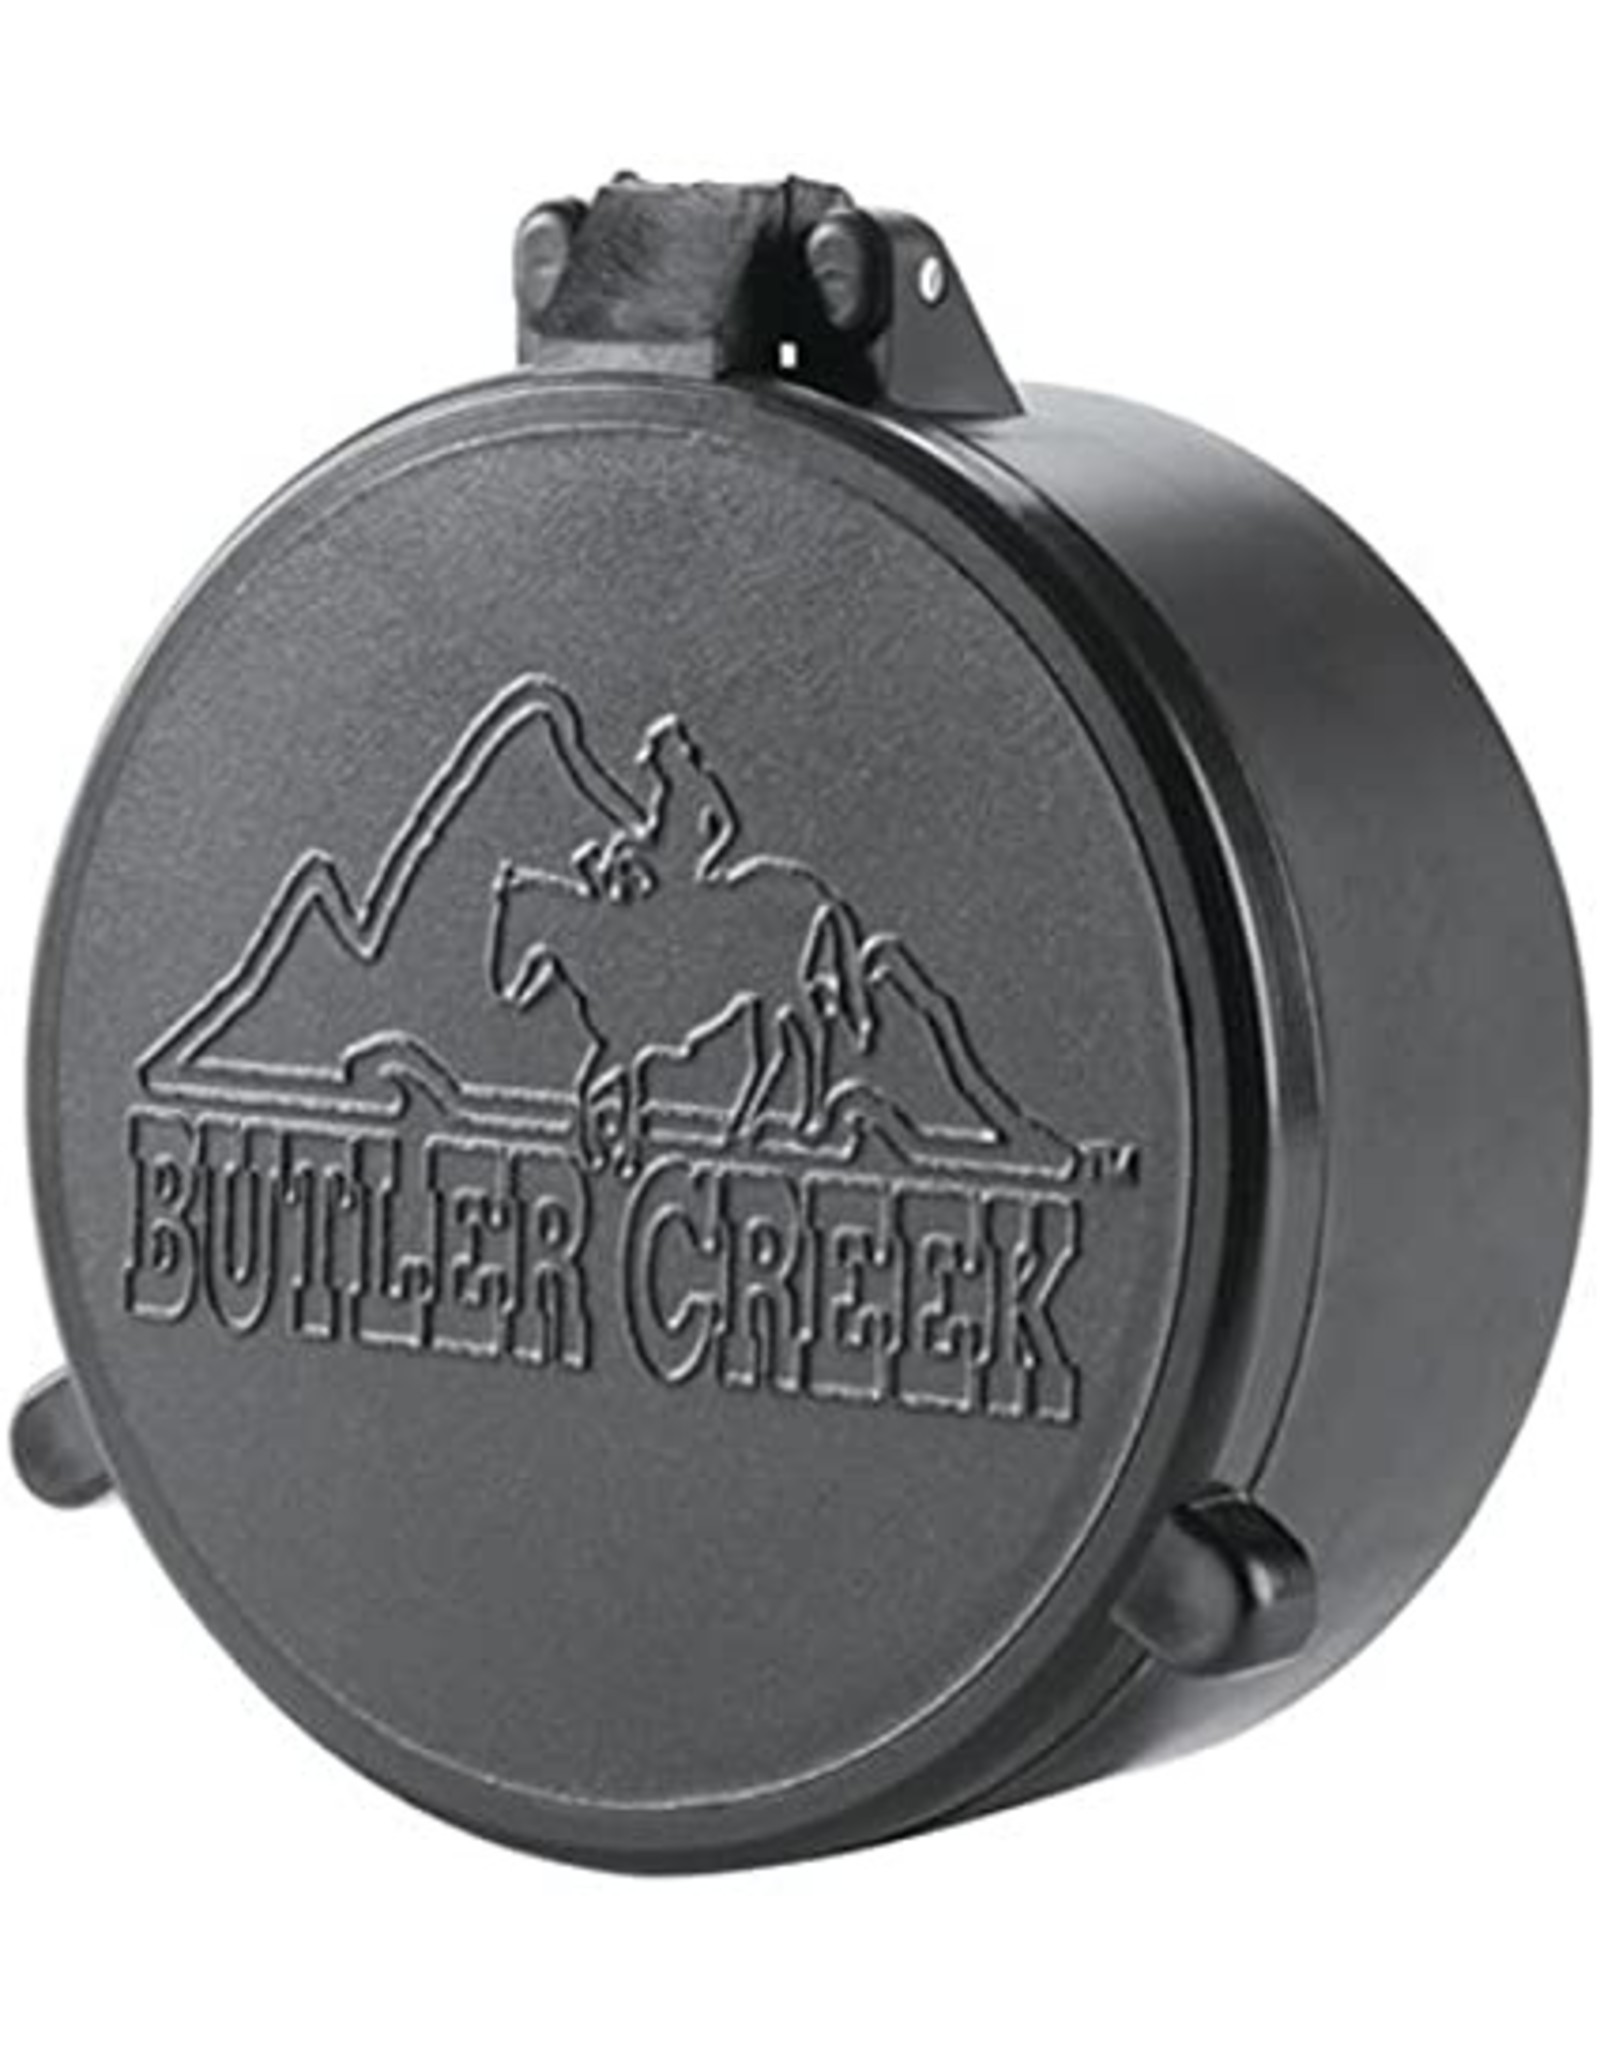 Butler Creek Butler Creek 21 OBJ Flip Open Cap Scope Cover